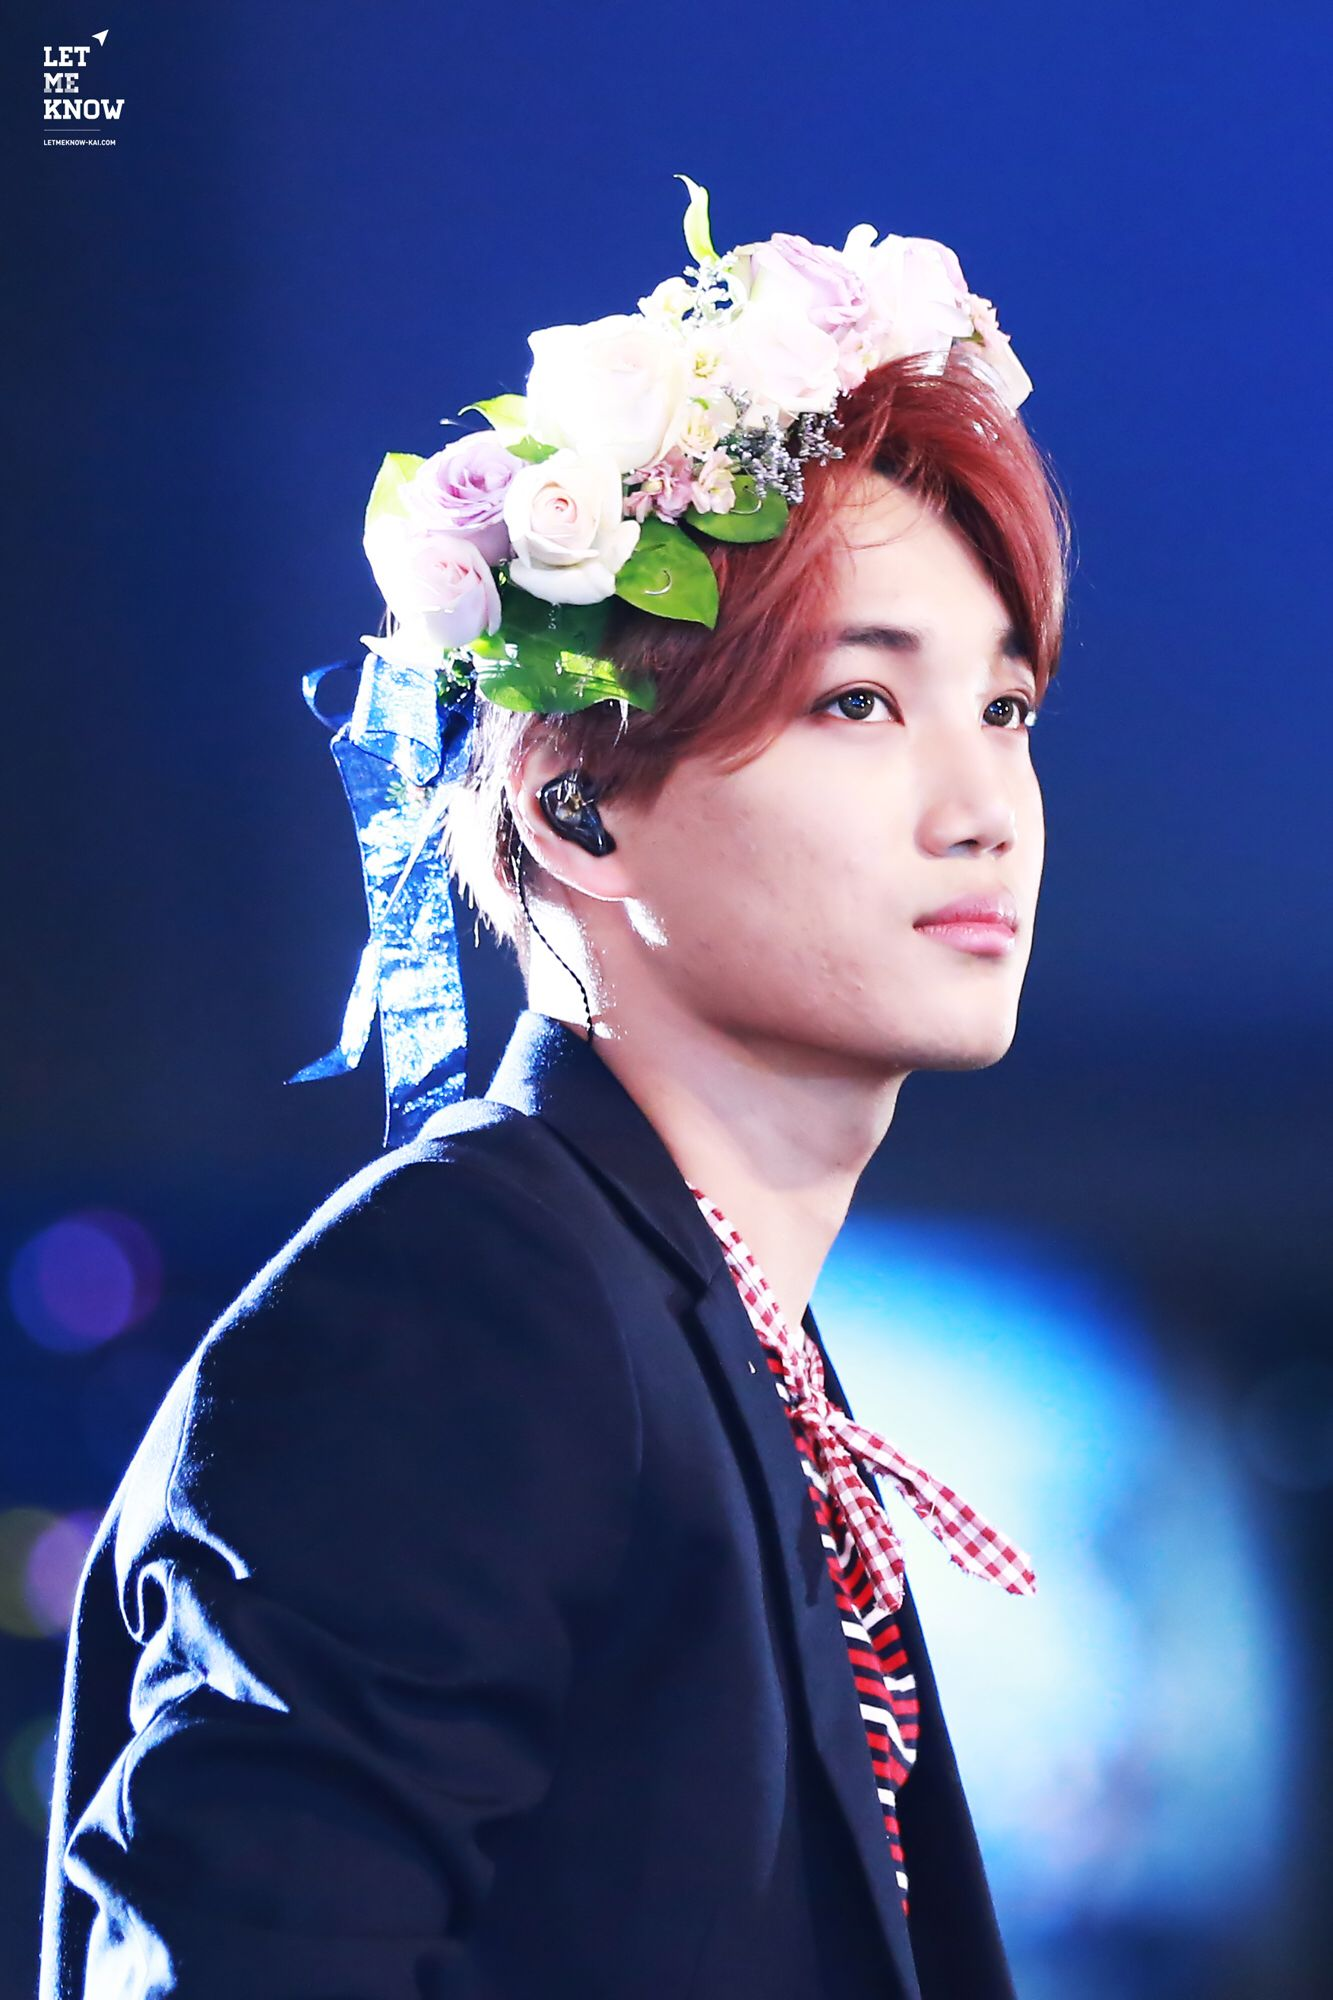 Kai with his flower crown kim jongin in 2018 pinterest kai with his flower crown izmirmasajfo